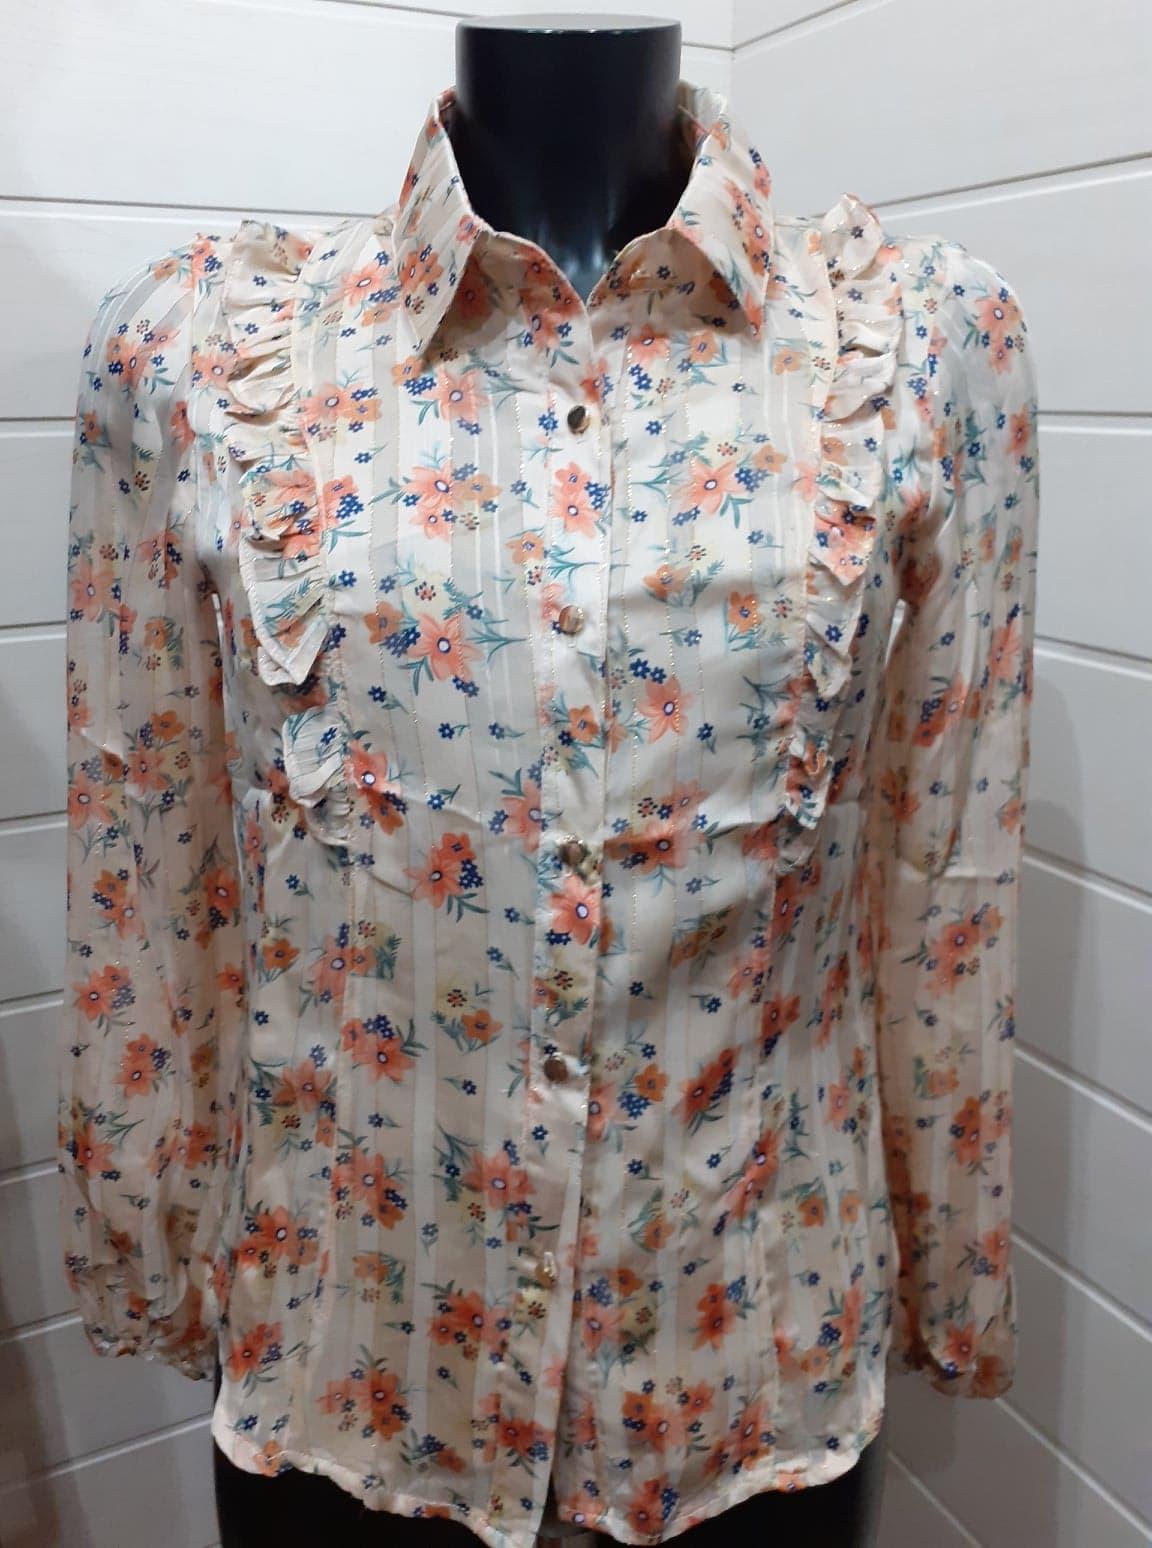 chemise beige fleuri  - che-bei-fle